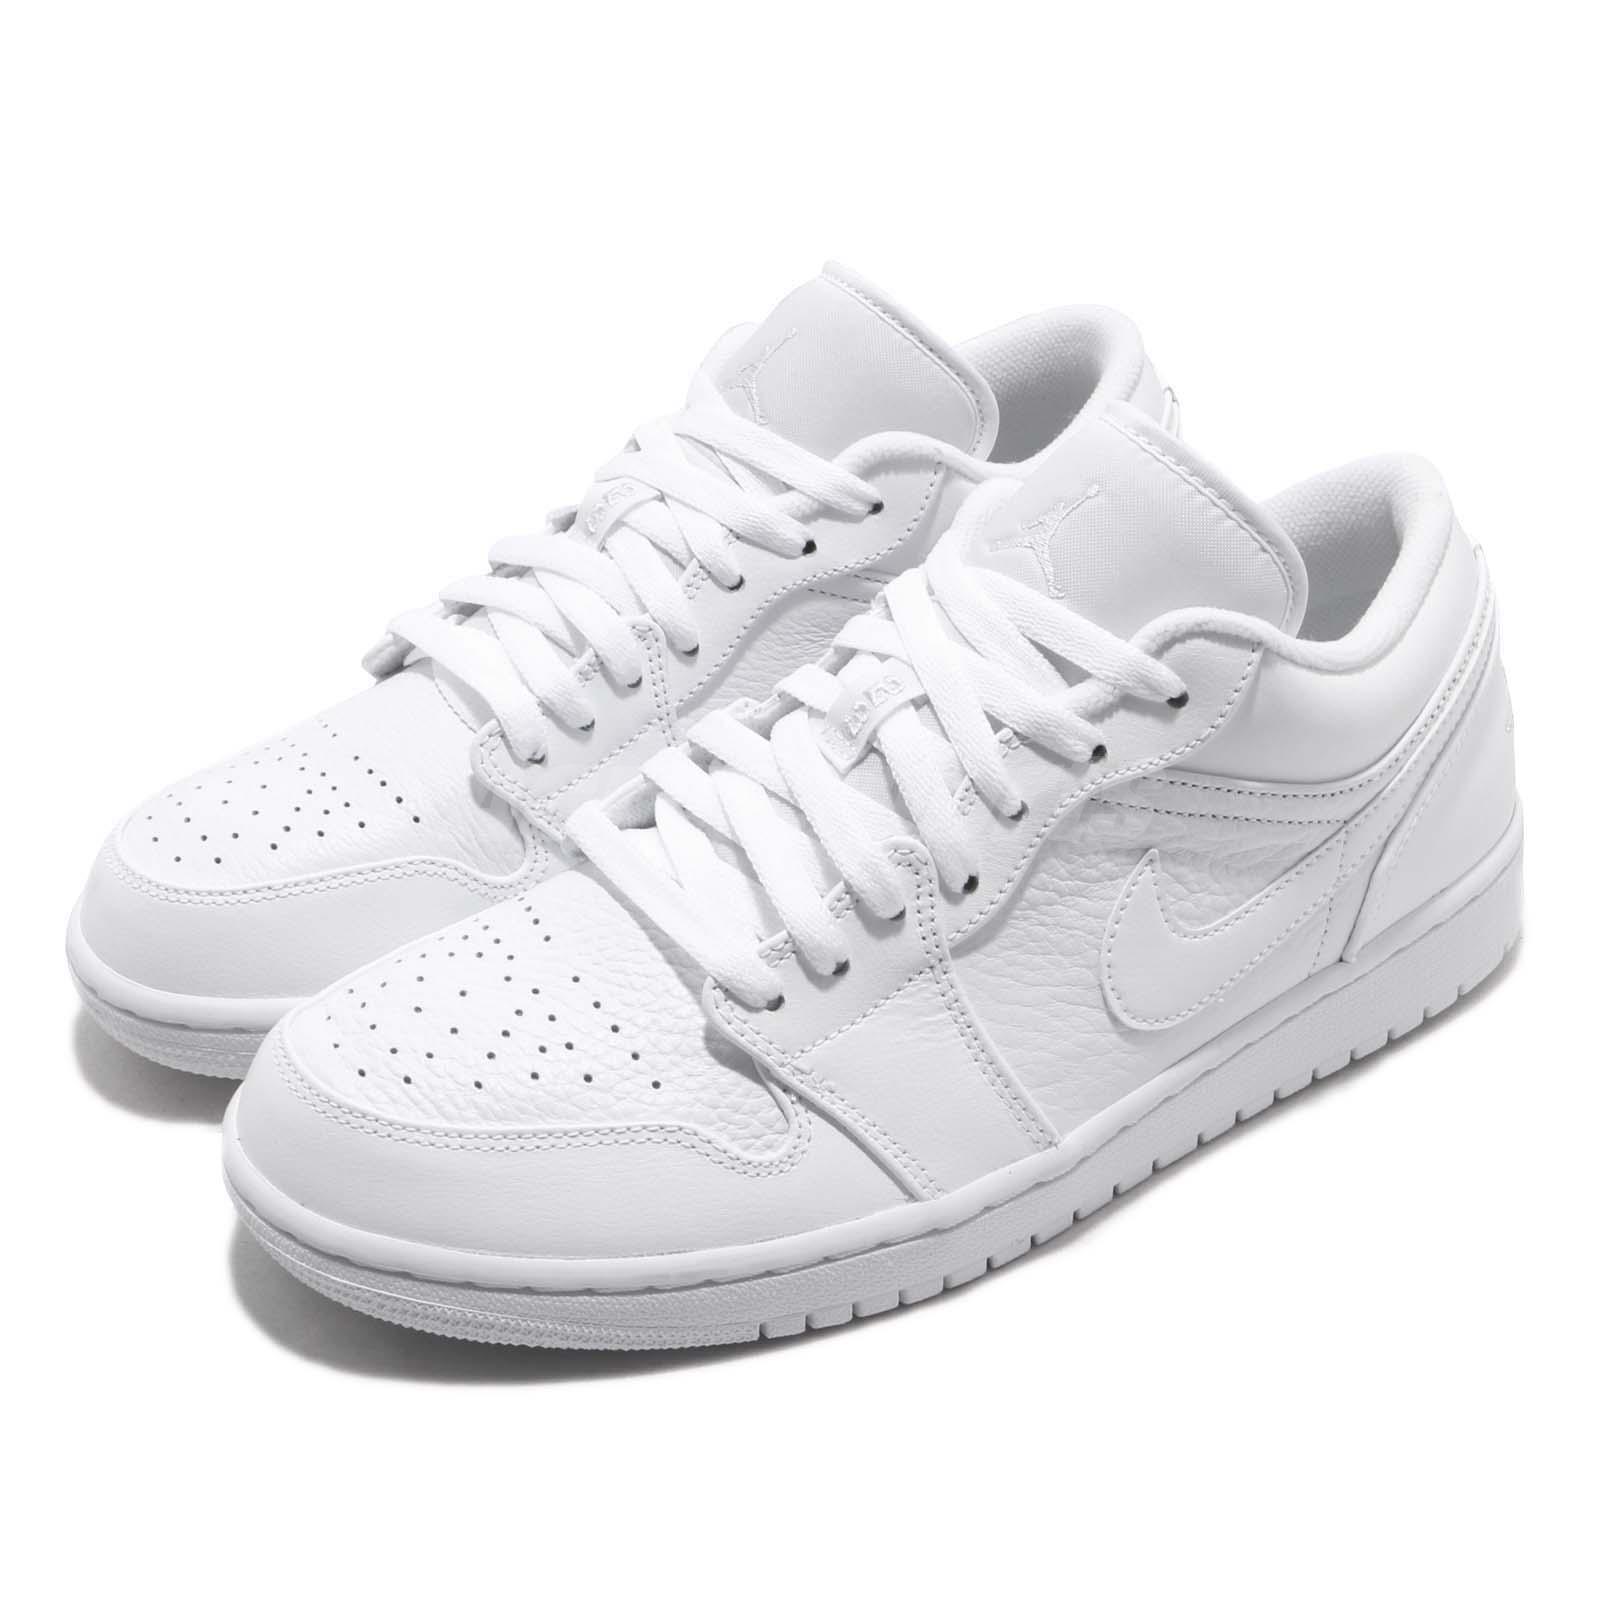 fcf6a8b068a Details about Nike Air Jordan 1 Low I AJ1 White Pure Platinum Men  Basketball Shoes 553558-111